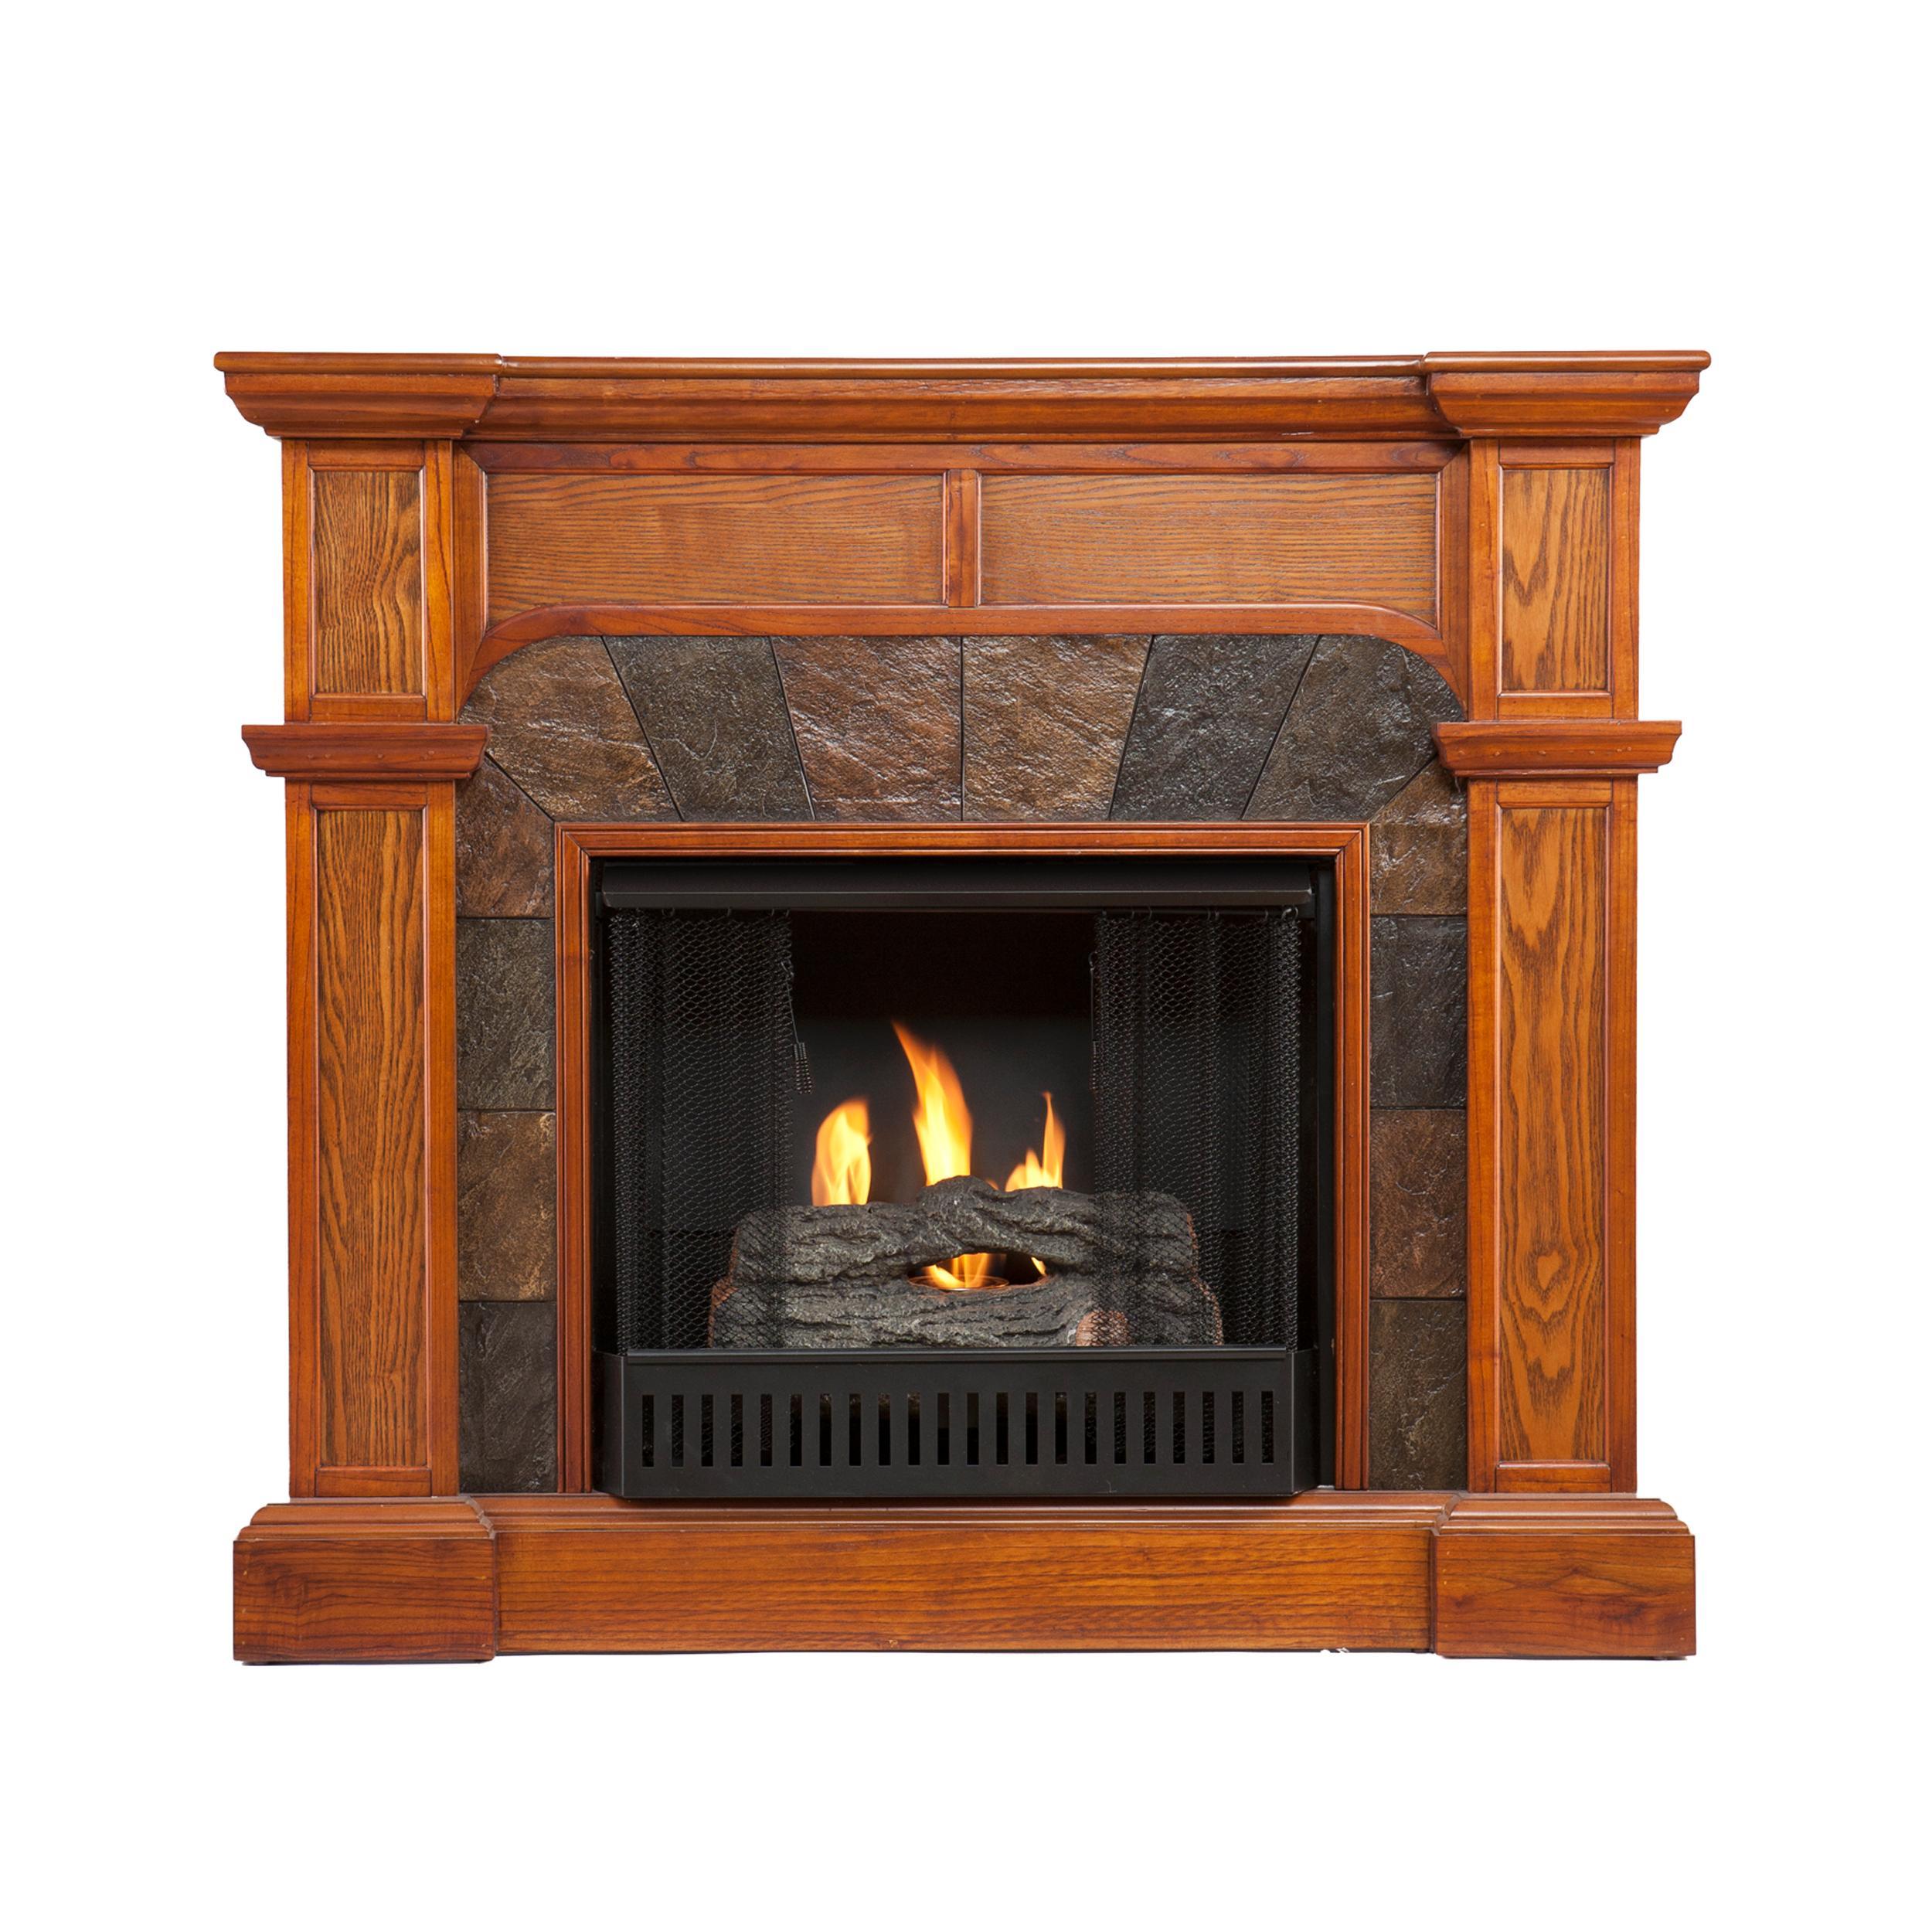 Gel Gel Cans For Fireplace Gel Fuel Safety